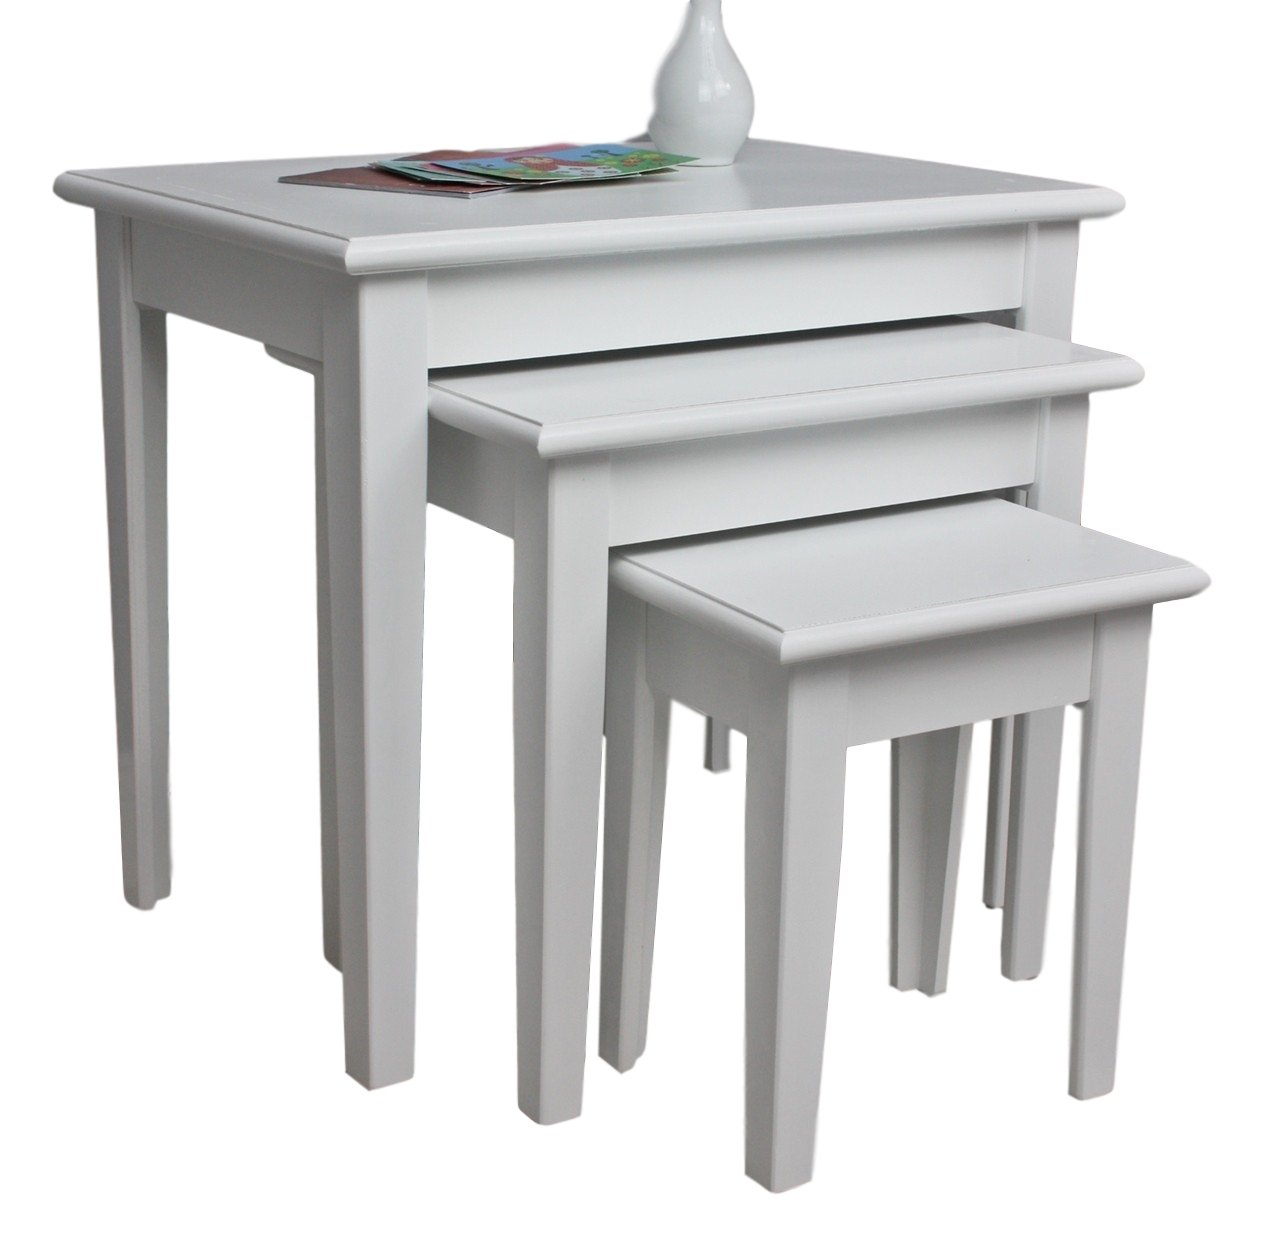 elbmoebel 3X tavolo tavolino bianco antico shabby chic Comodino Set Console